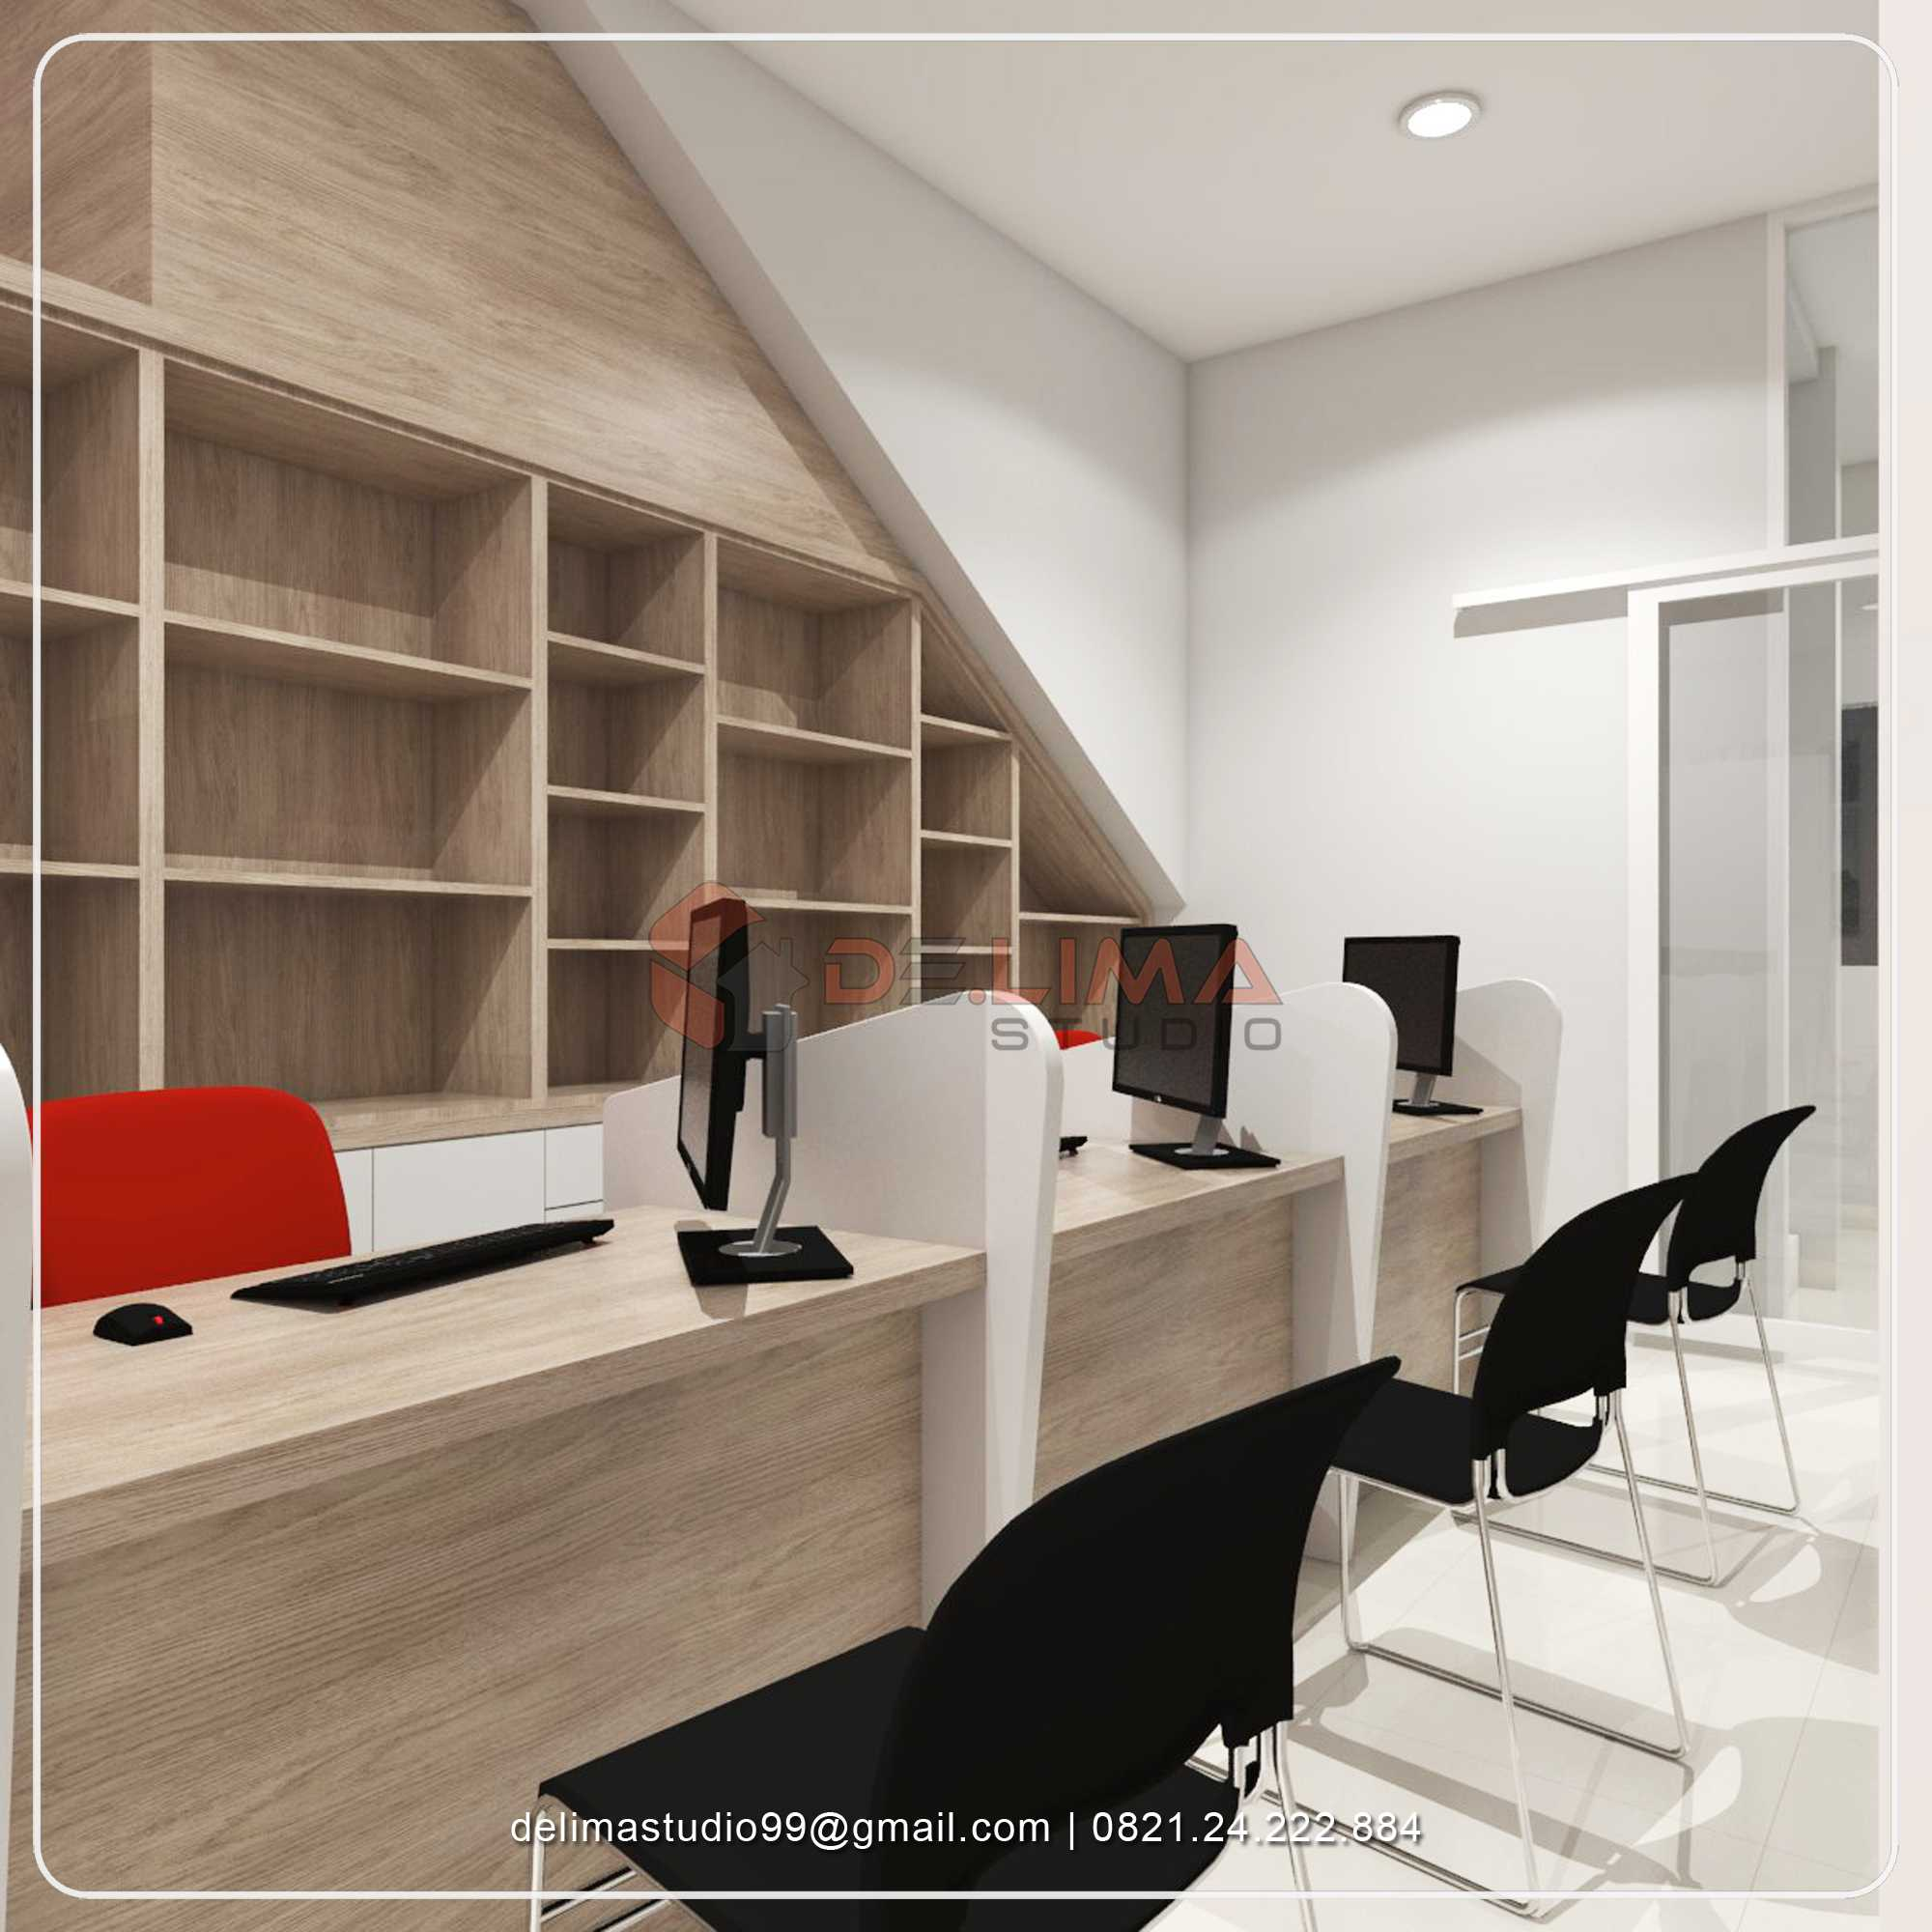 Delima Studio Office At Cikarang Sukamahi, Kec. Cikarang Pusat, Bekasi, Jawa Barat 17530, Indonesia Sukamahi, Kec. Cikarang Pusat, Bekasi, Jawa Barat 17530, Indonesia Delima-Studio-Office-At-Cikarang Modern 77708